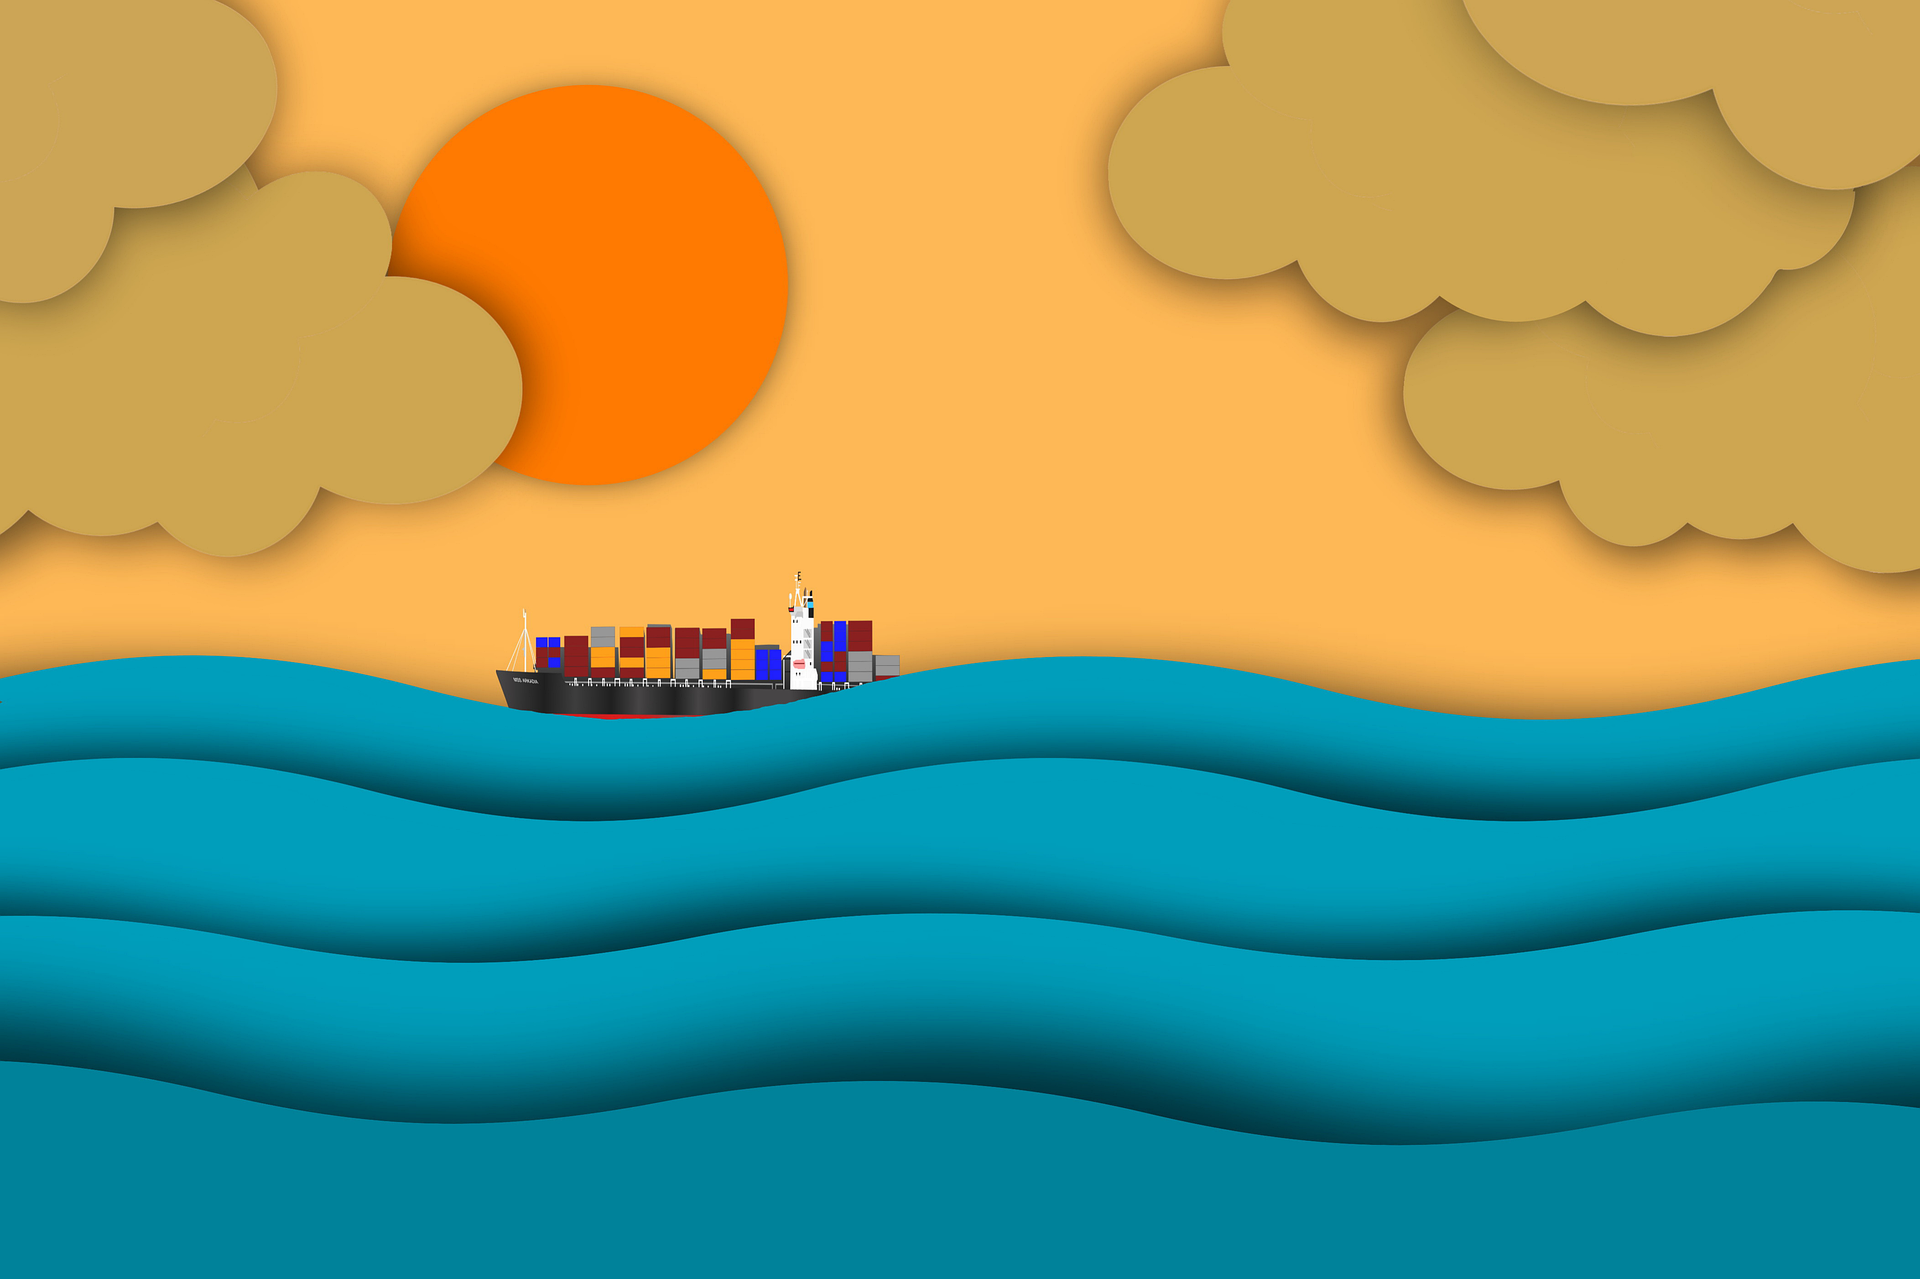 Cargoship sunrise 5863751 1920